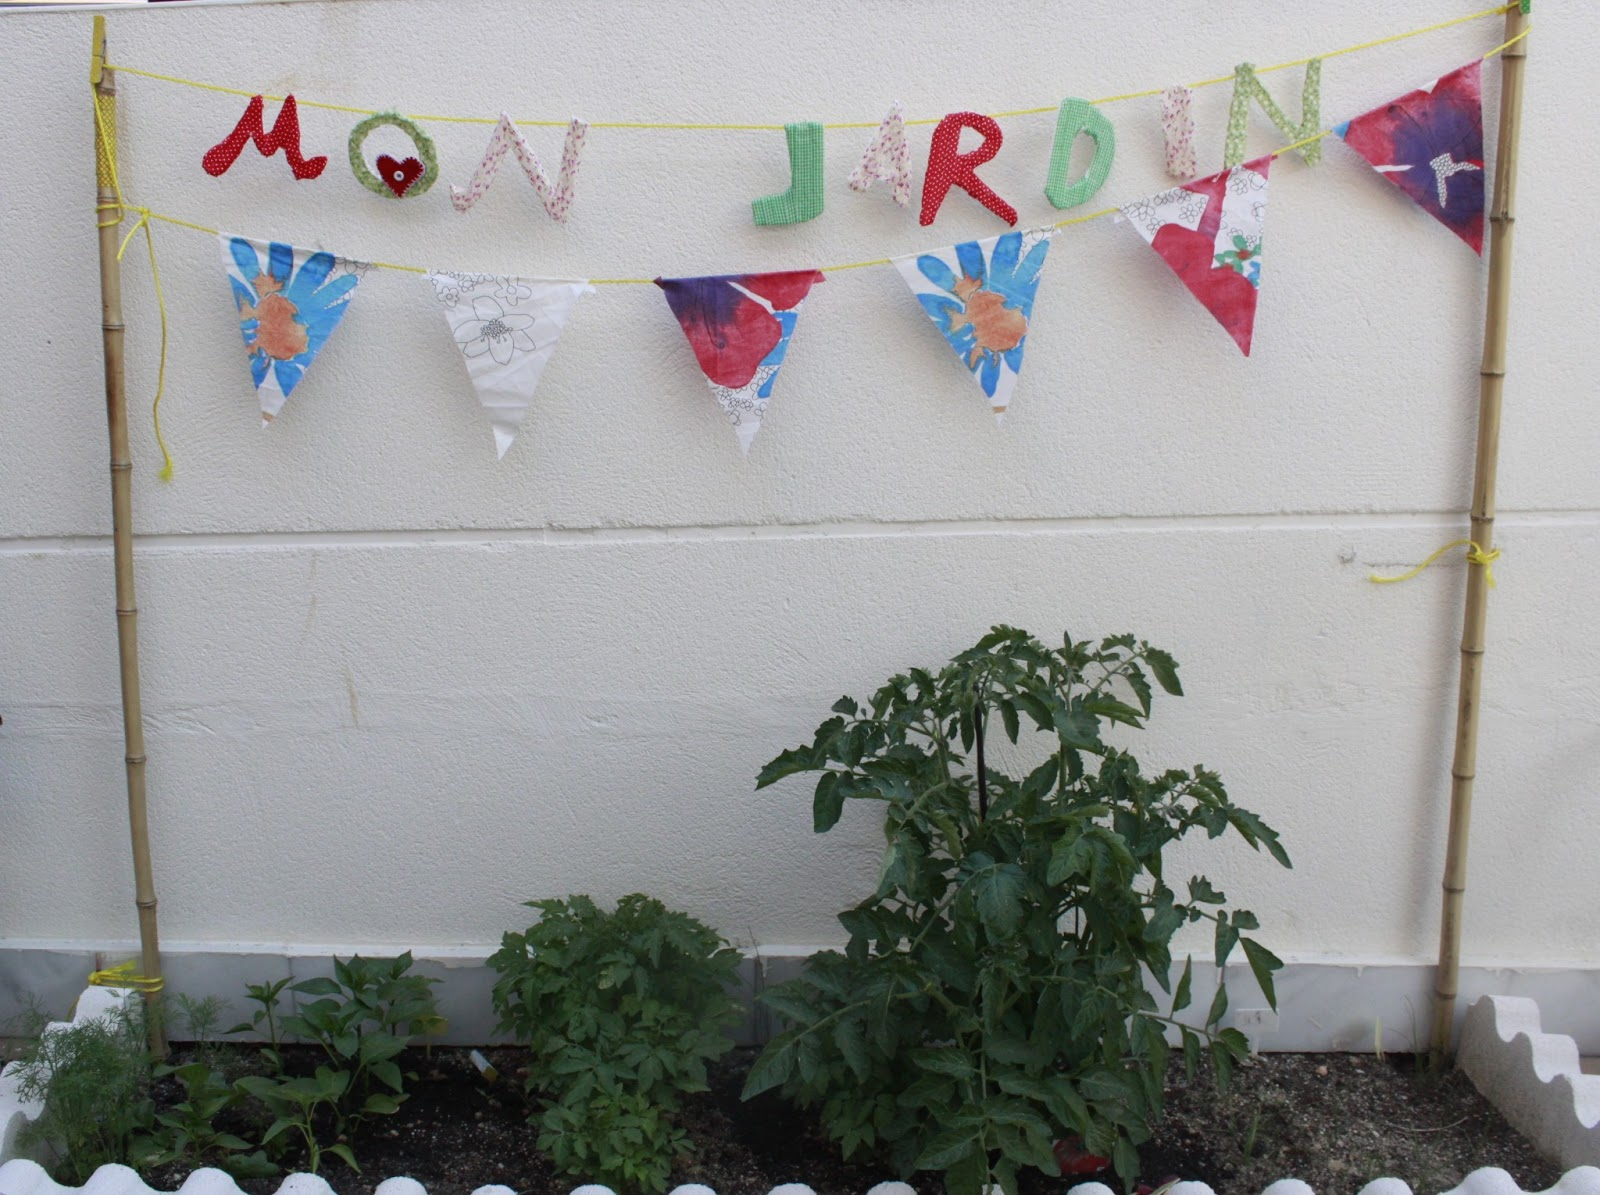 Manualidades en casa manualidades con ni os decoraci n for Decoracion jardin ninos